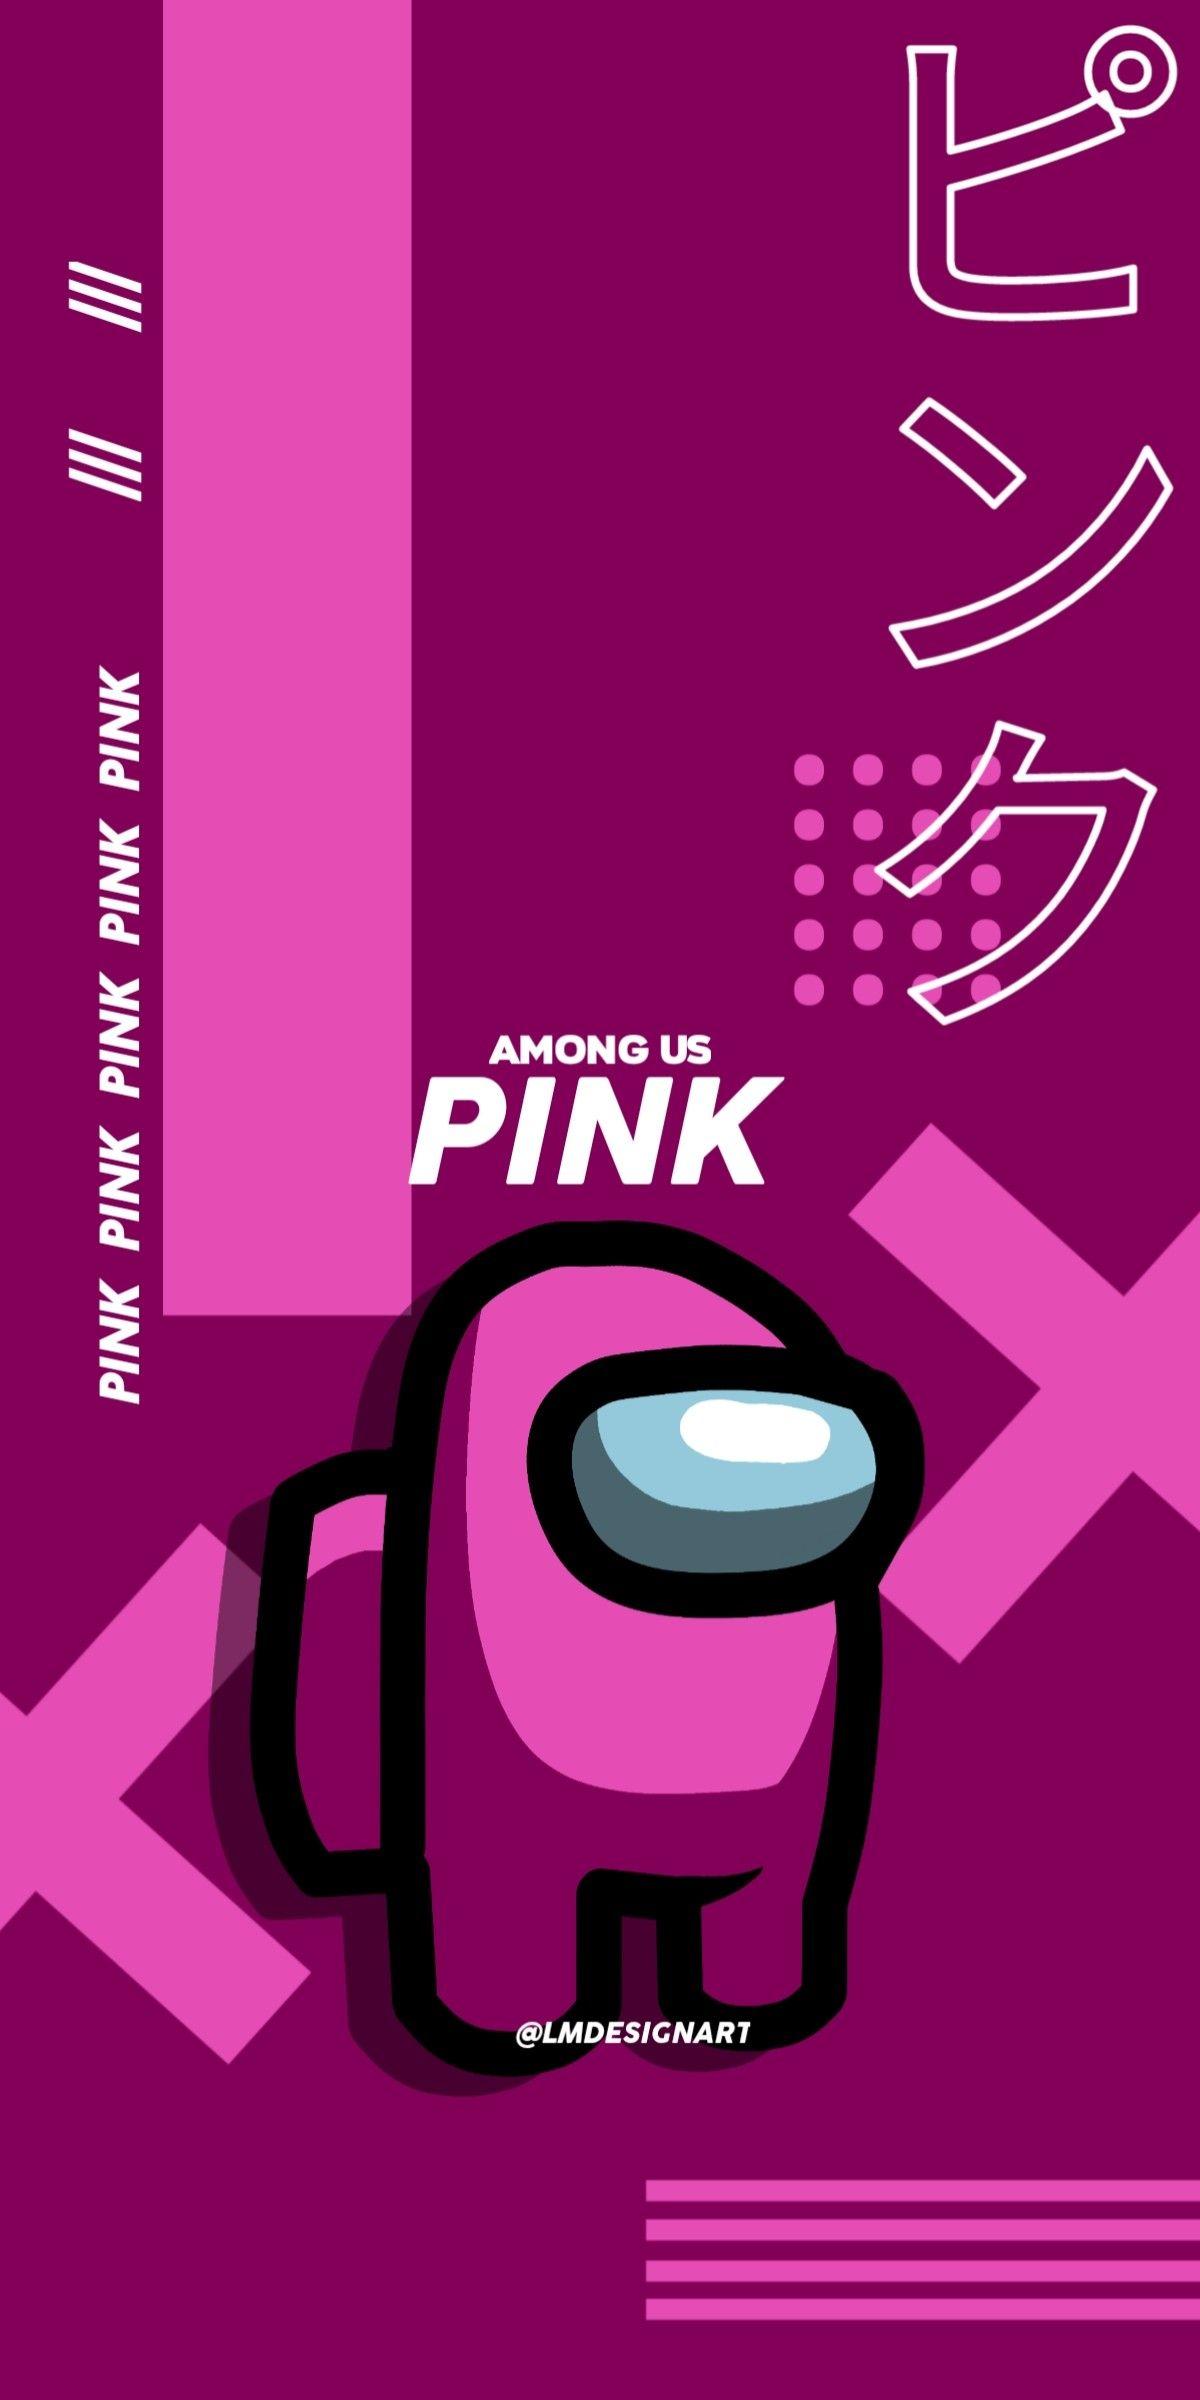 Among Us Pink Cute Patterns Wallpaper Cute Cartoon Wallpapers Funny Phone Wallpaper